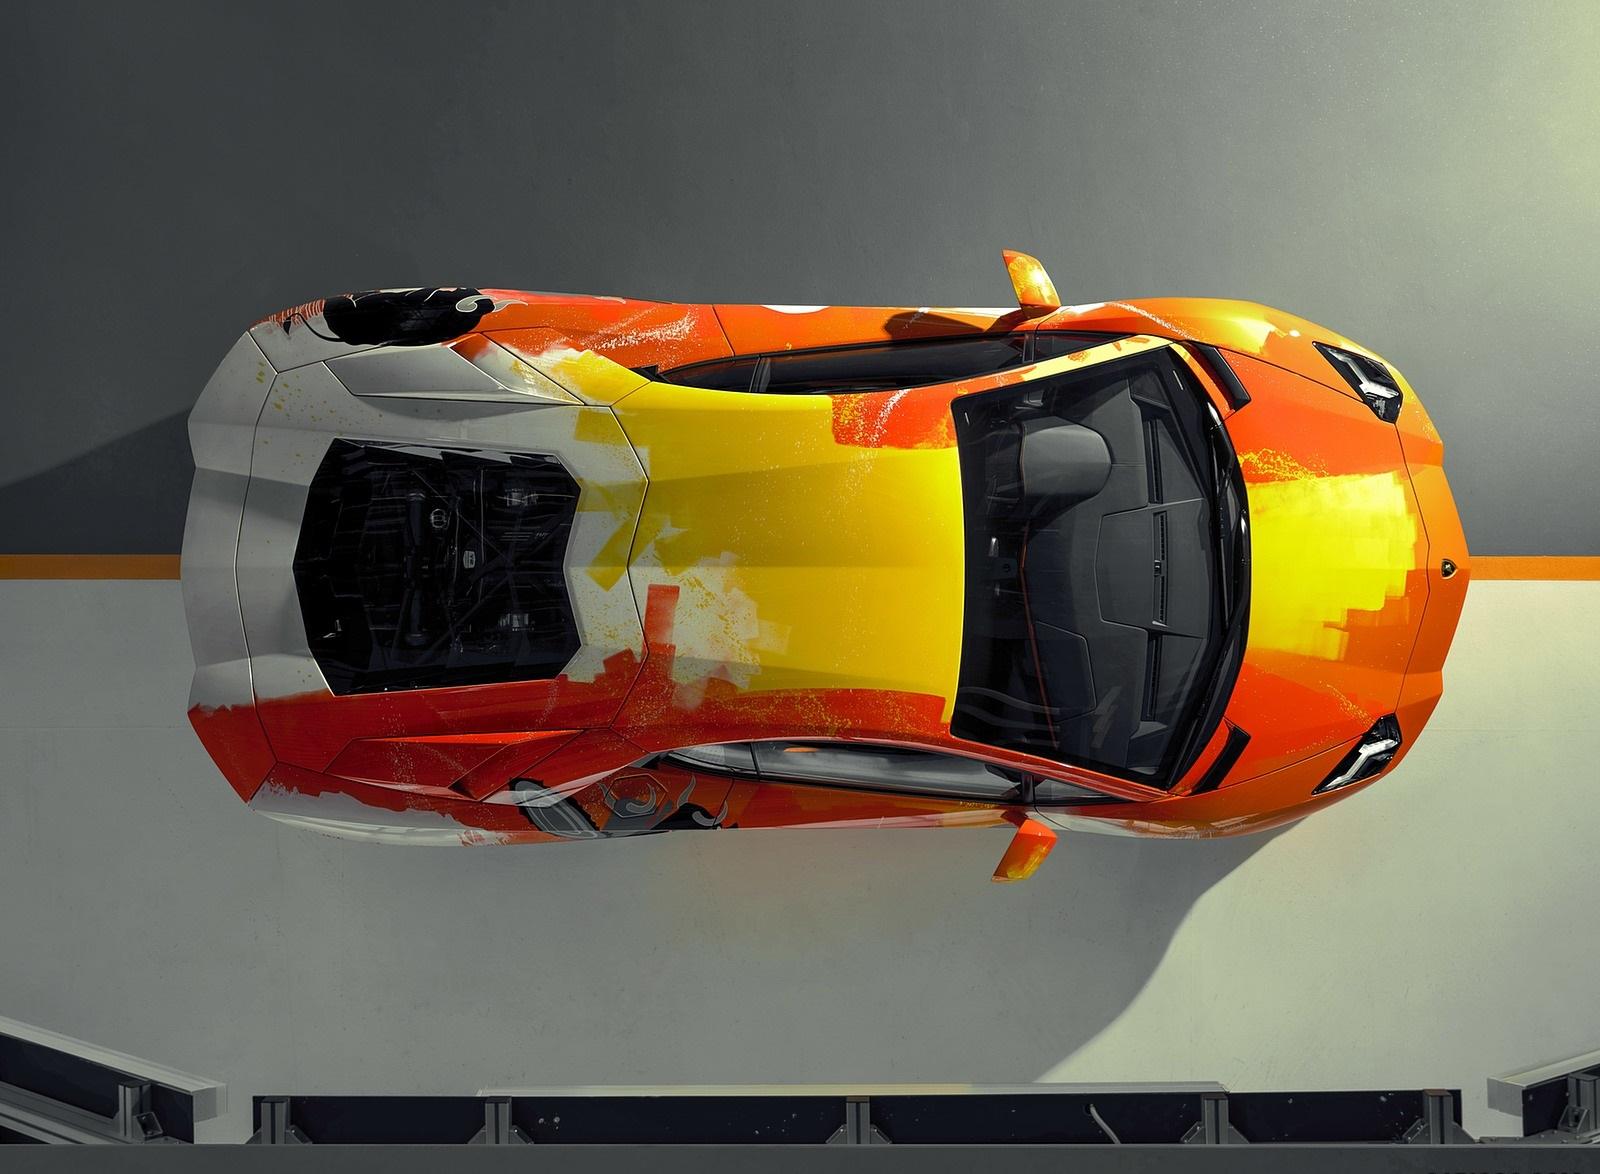 2019 Lamborghini Aventador S by Skyler Grey Top Wallpapers (12)